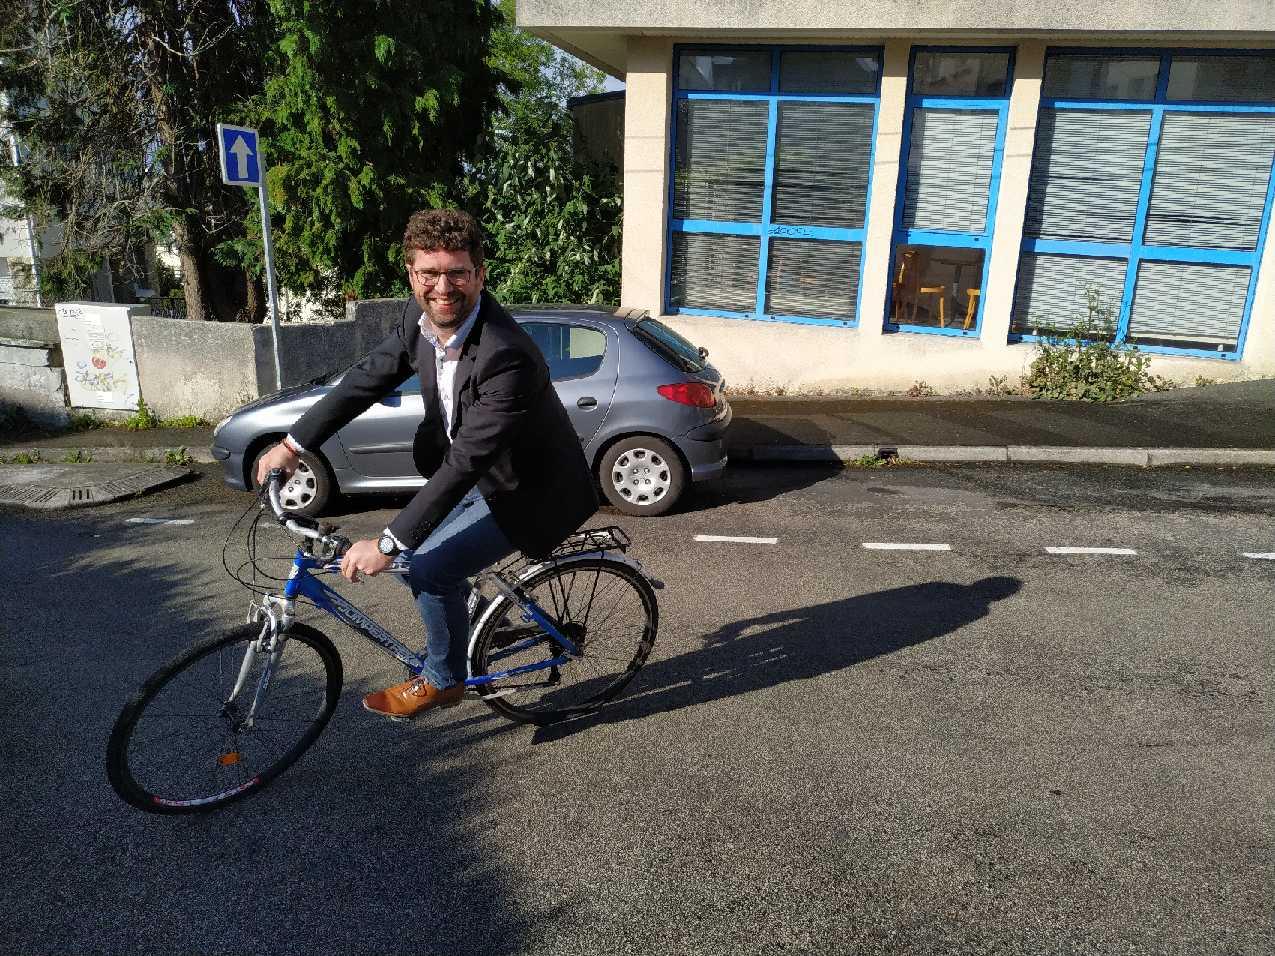 Jean-Jacques Carré – Cycle Chic